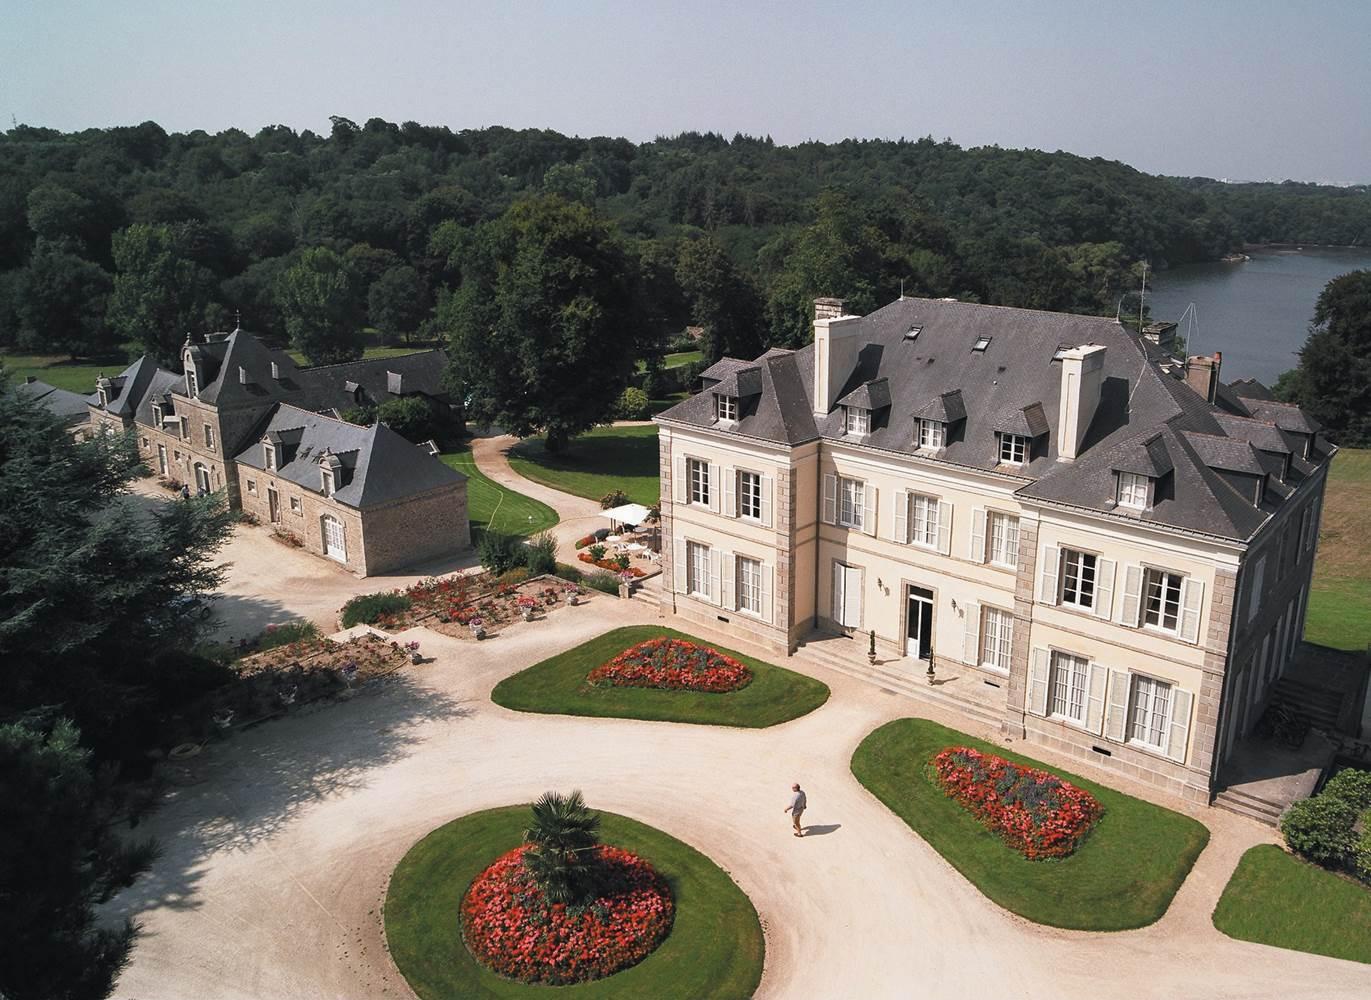 Hotel chateau locguénolé - kervignac - morbihan - bretagne sud ©